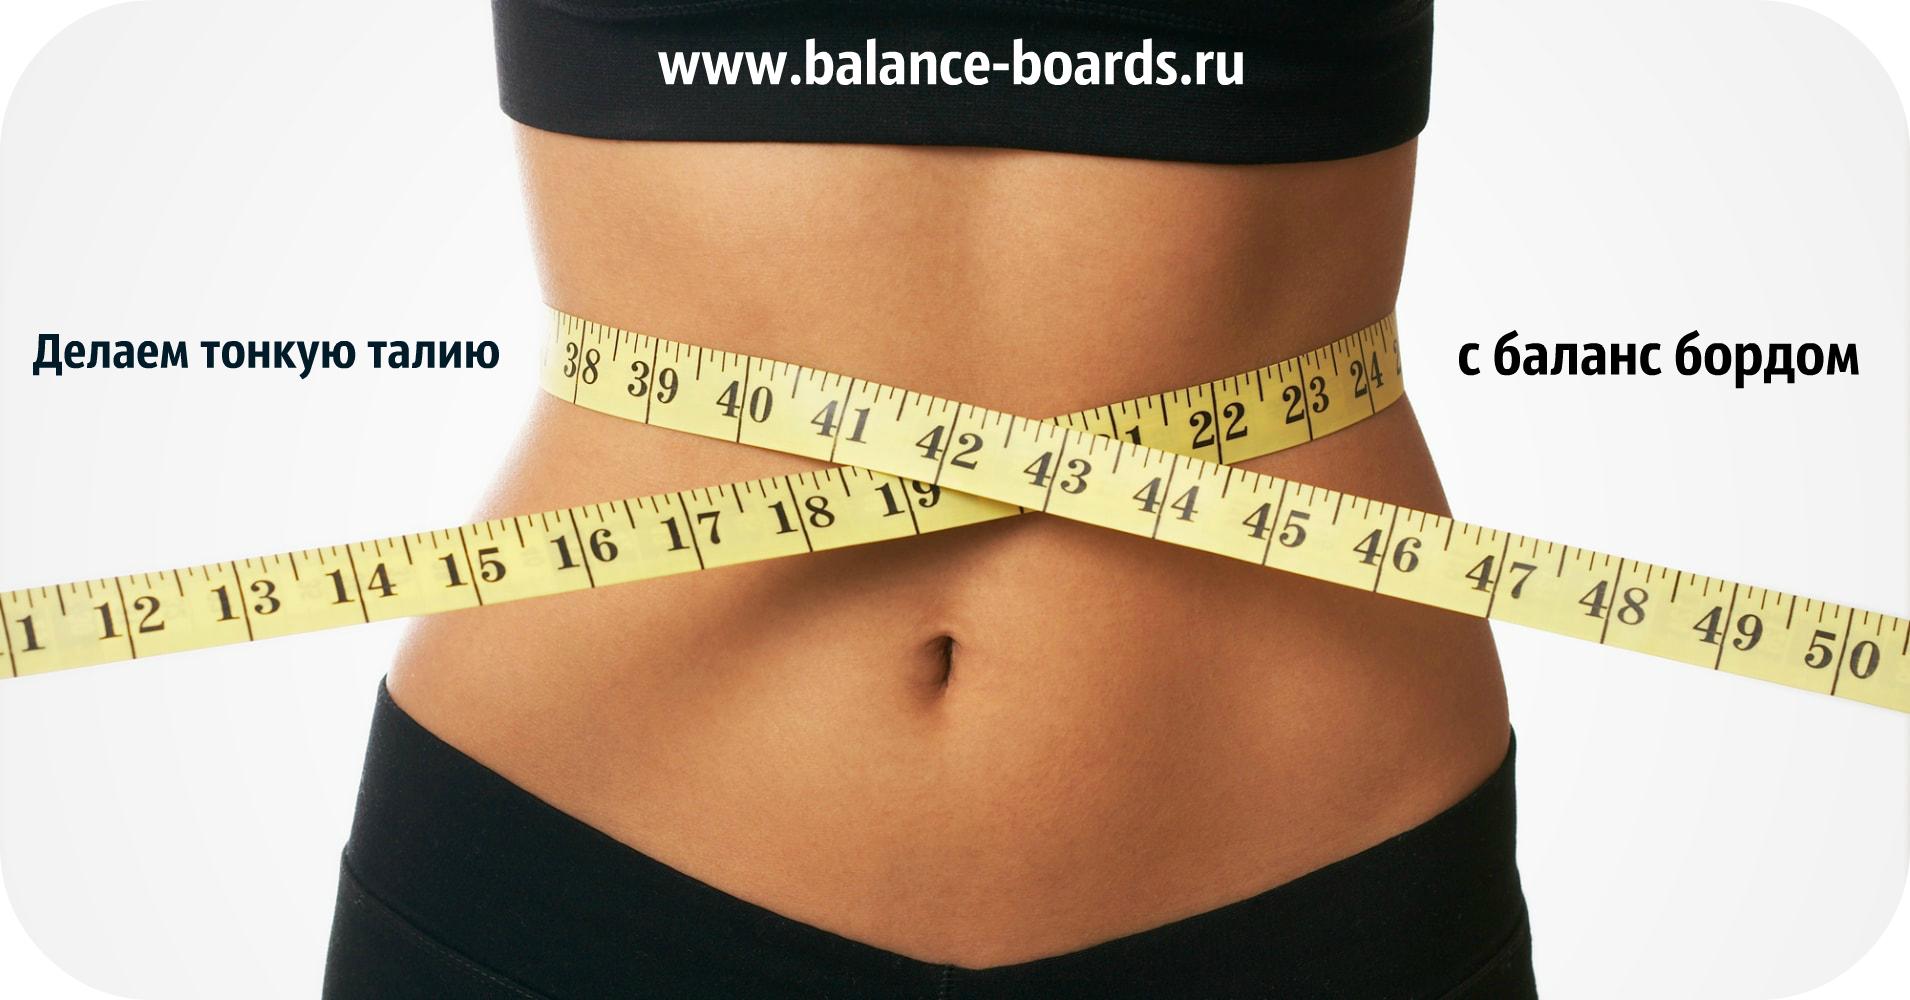 http://www.balance-boards.ru/images/upload/Делаем%20тонкую%20талию%20с%20баланс%20бордом.jpg